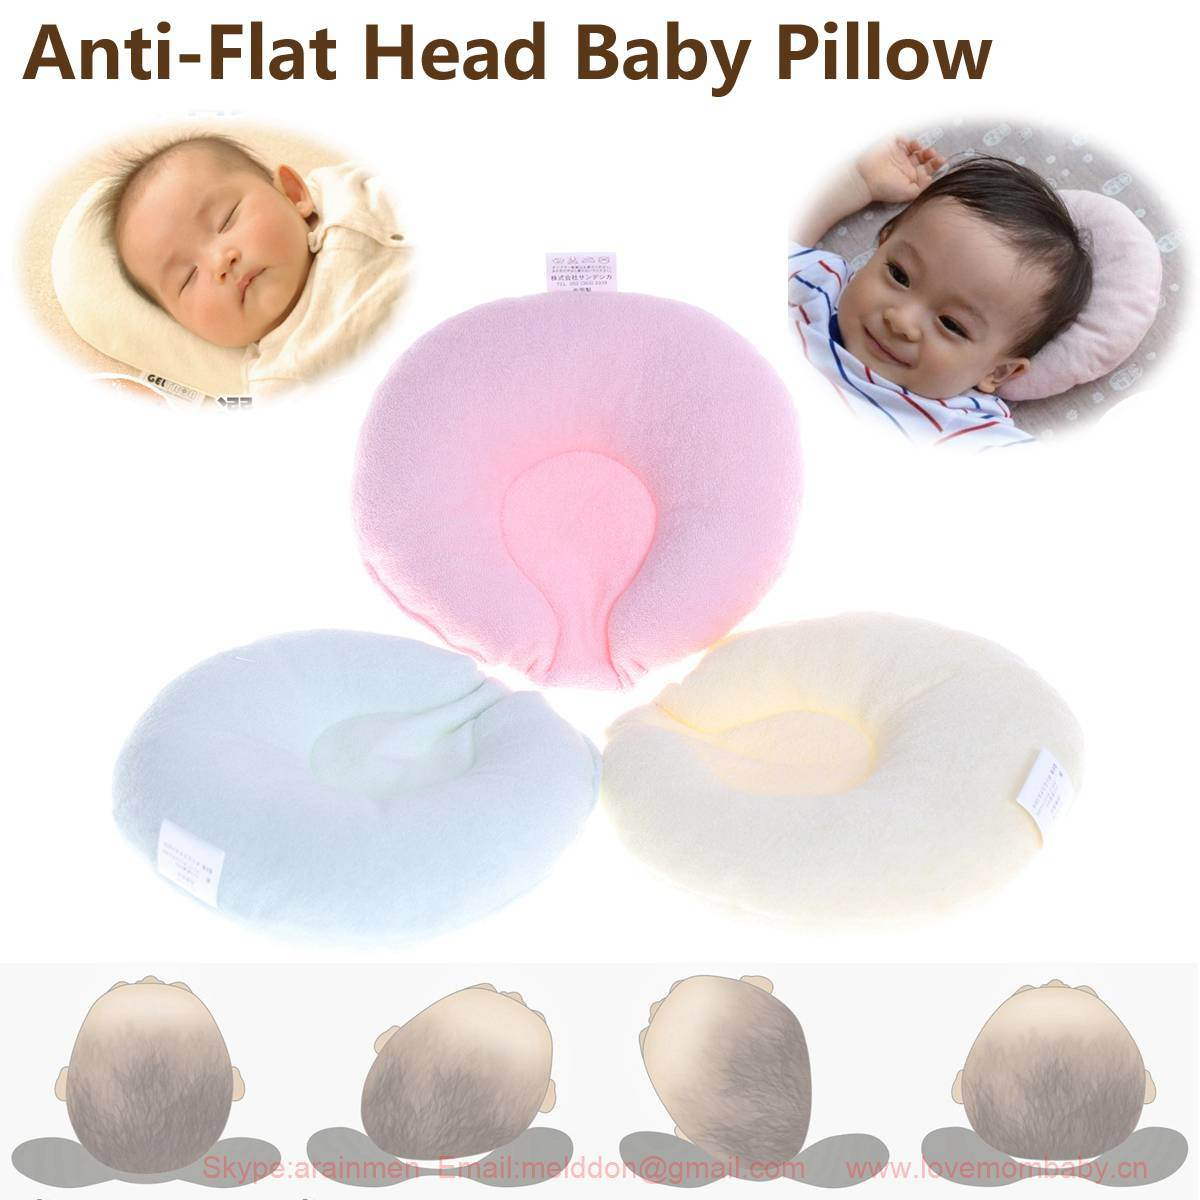 hot item sandexica newborn infant baby pillow support cushion anti flat head soft cotton